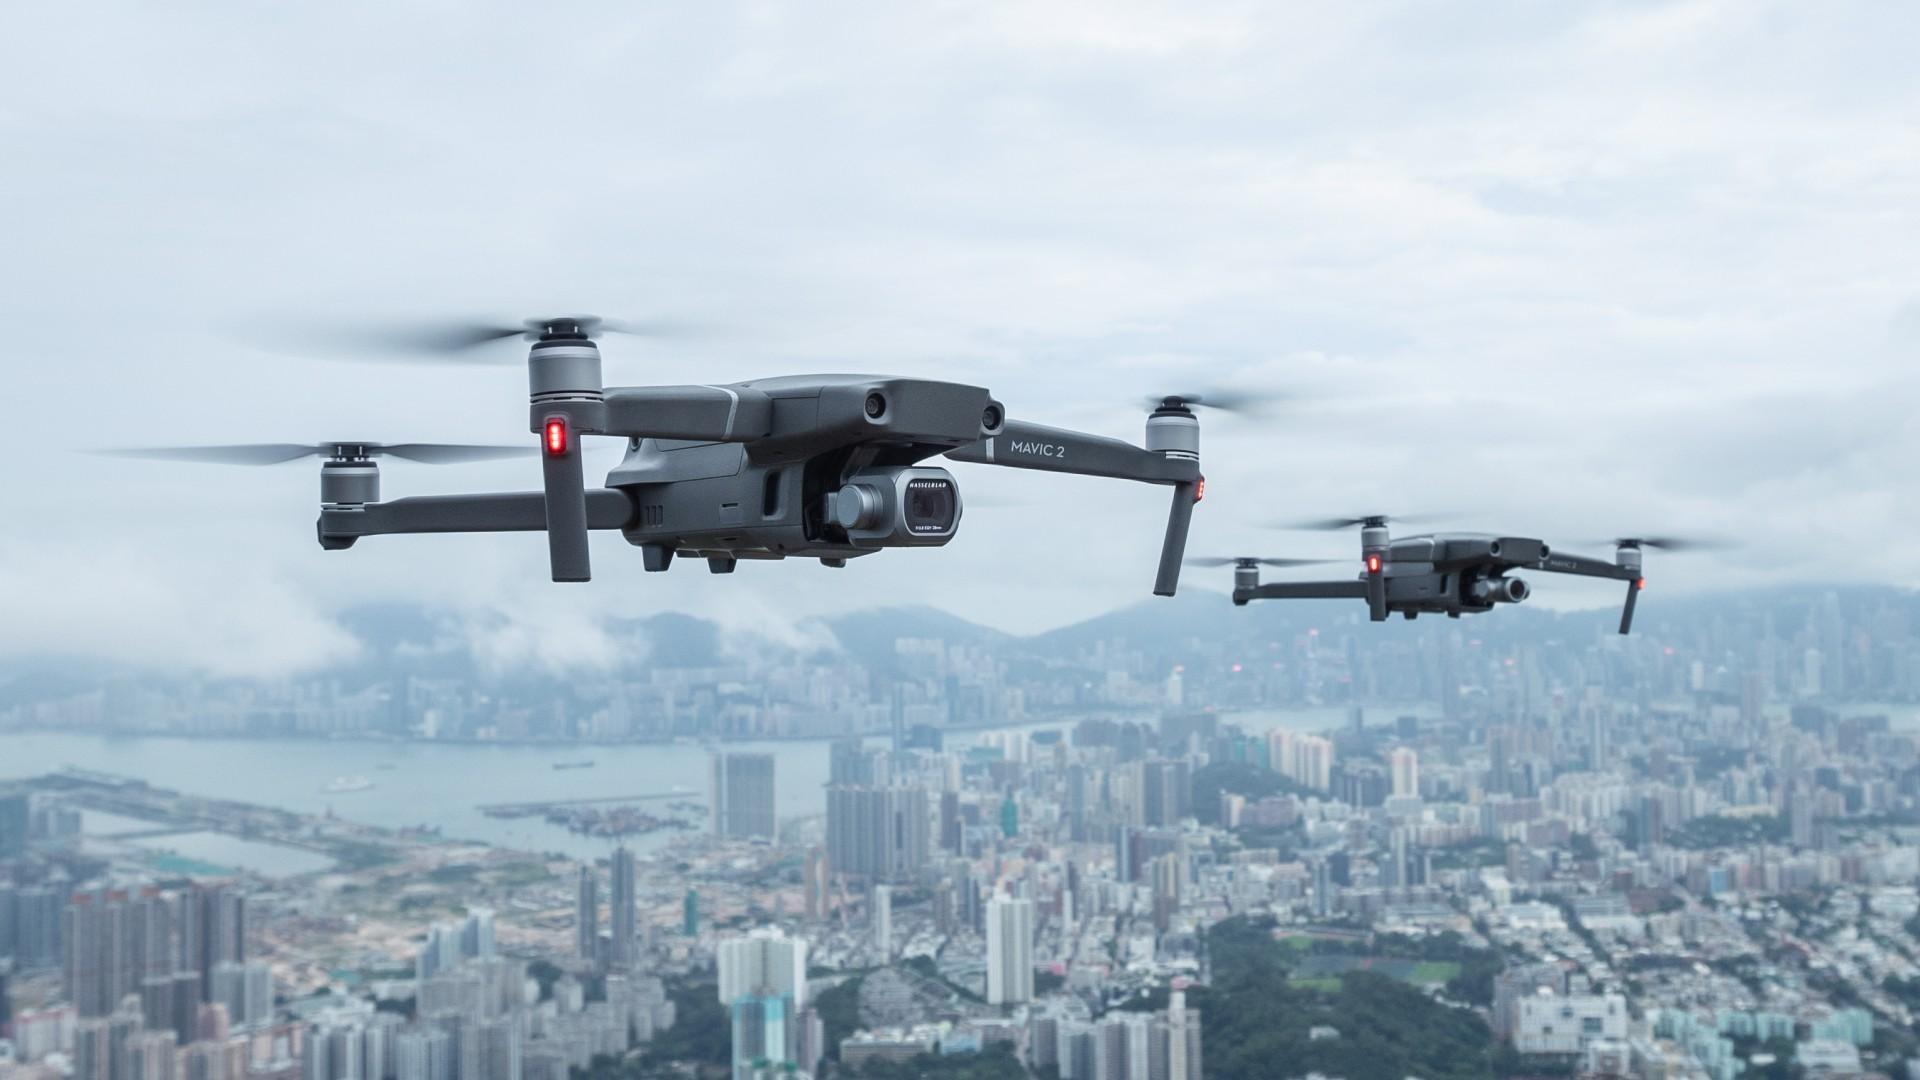 Wallpaper DJI Mavic 2 Pro, best drones, 4K, Hi-Tech #20204